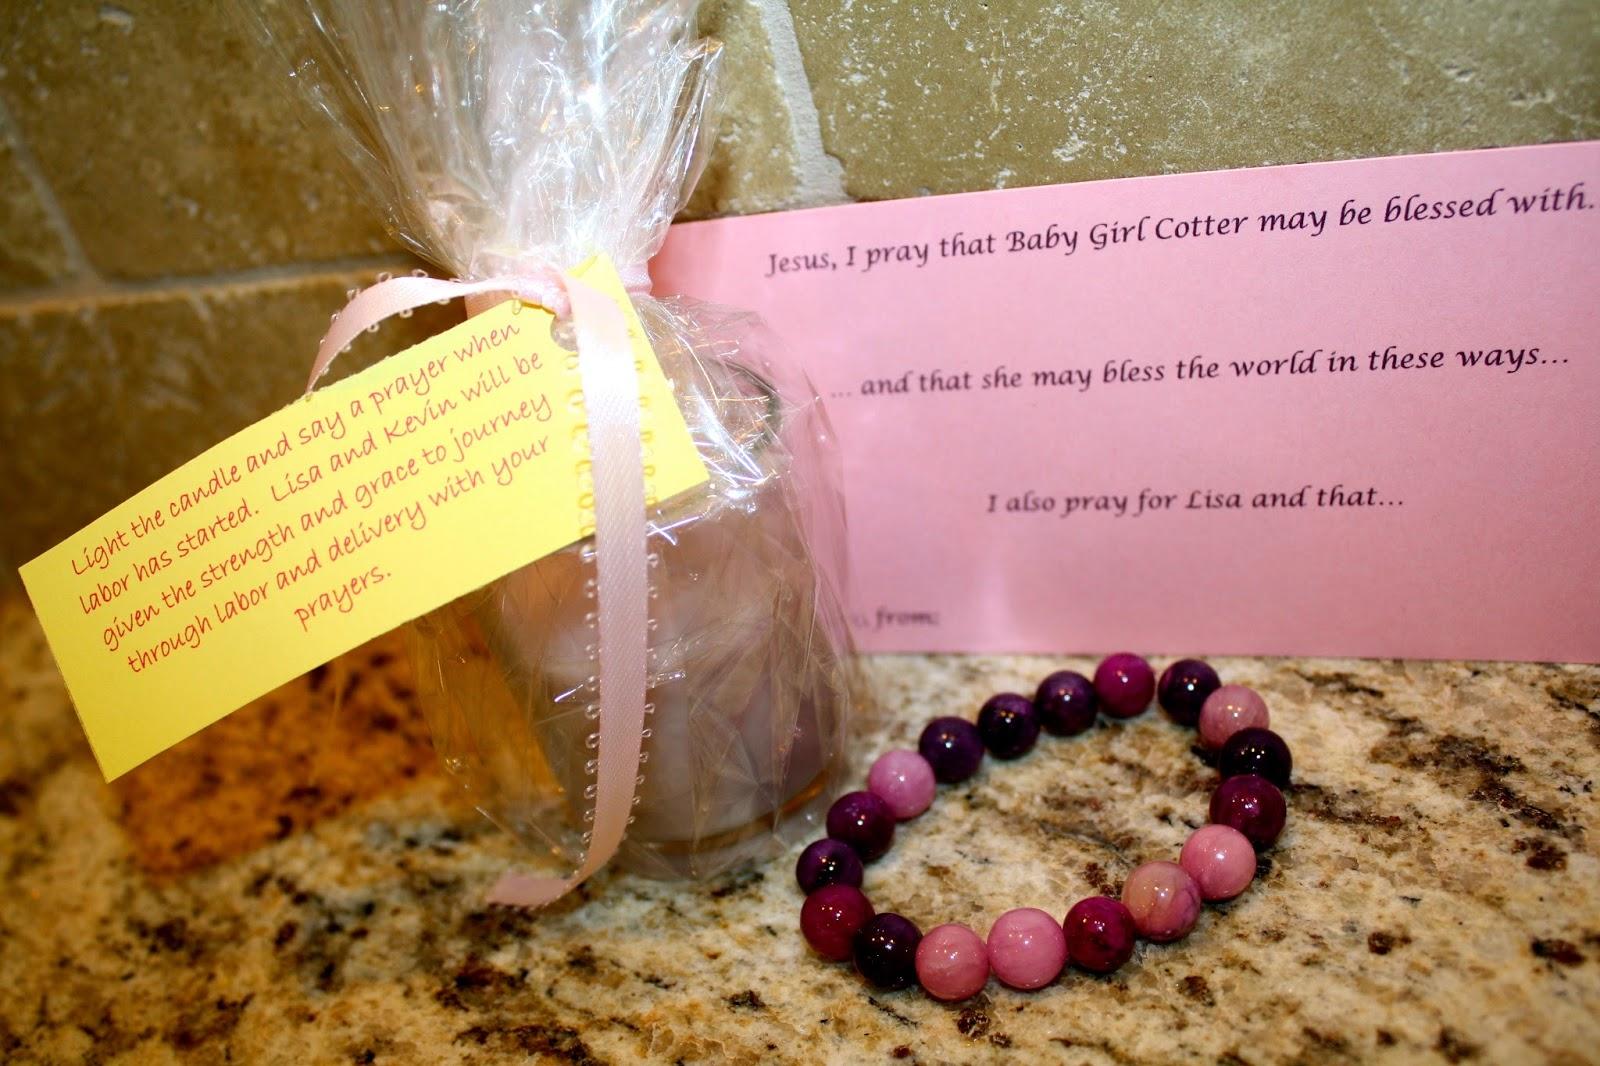 Catholic prayer for good dreams